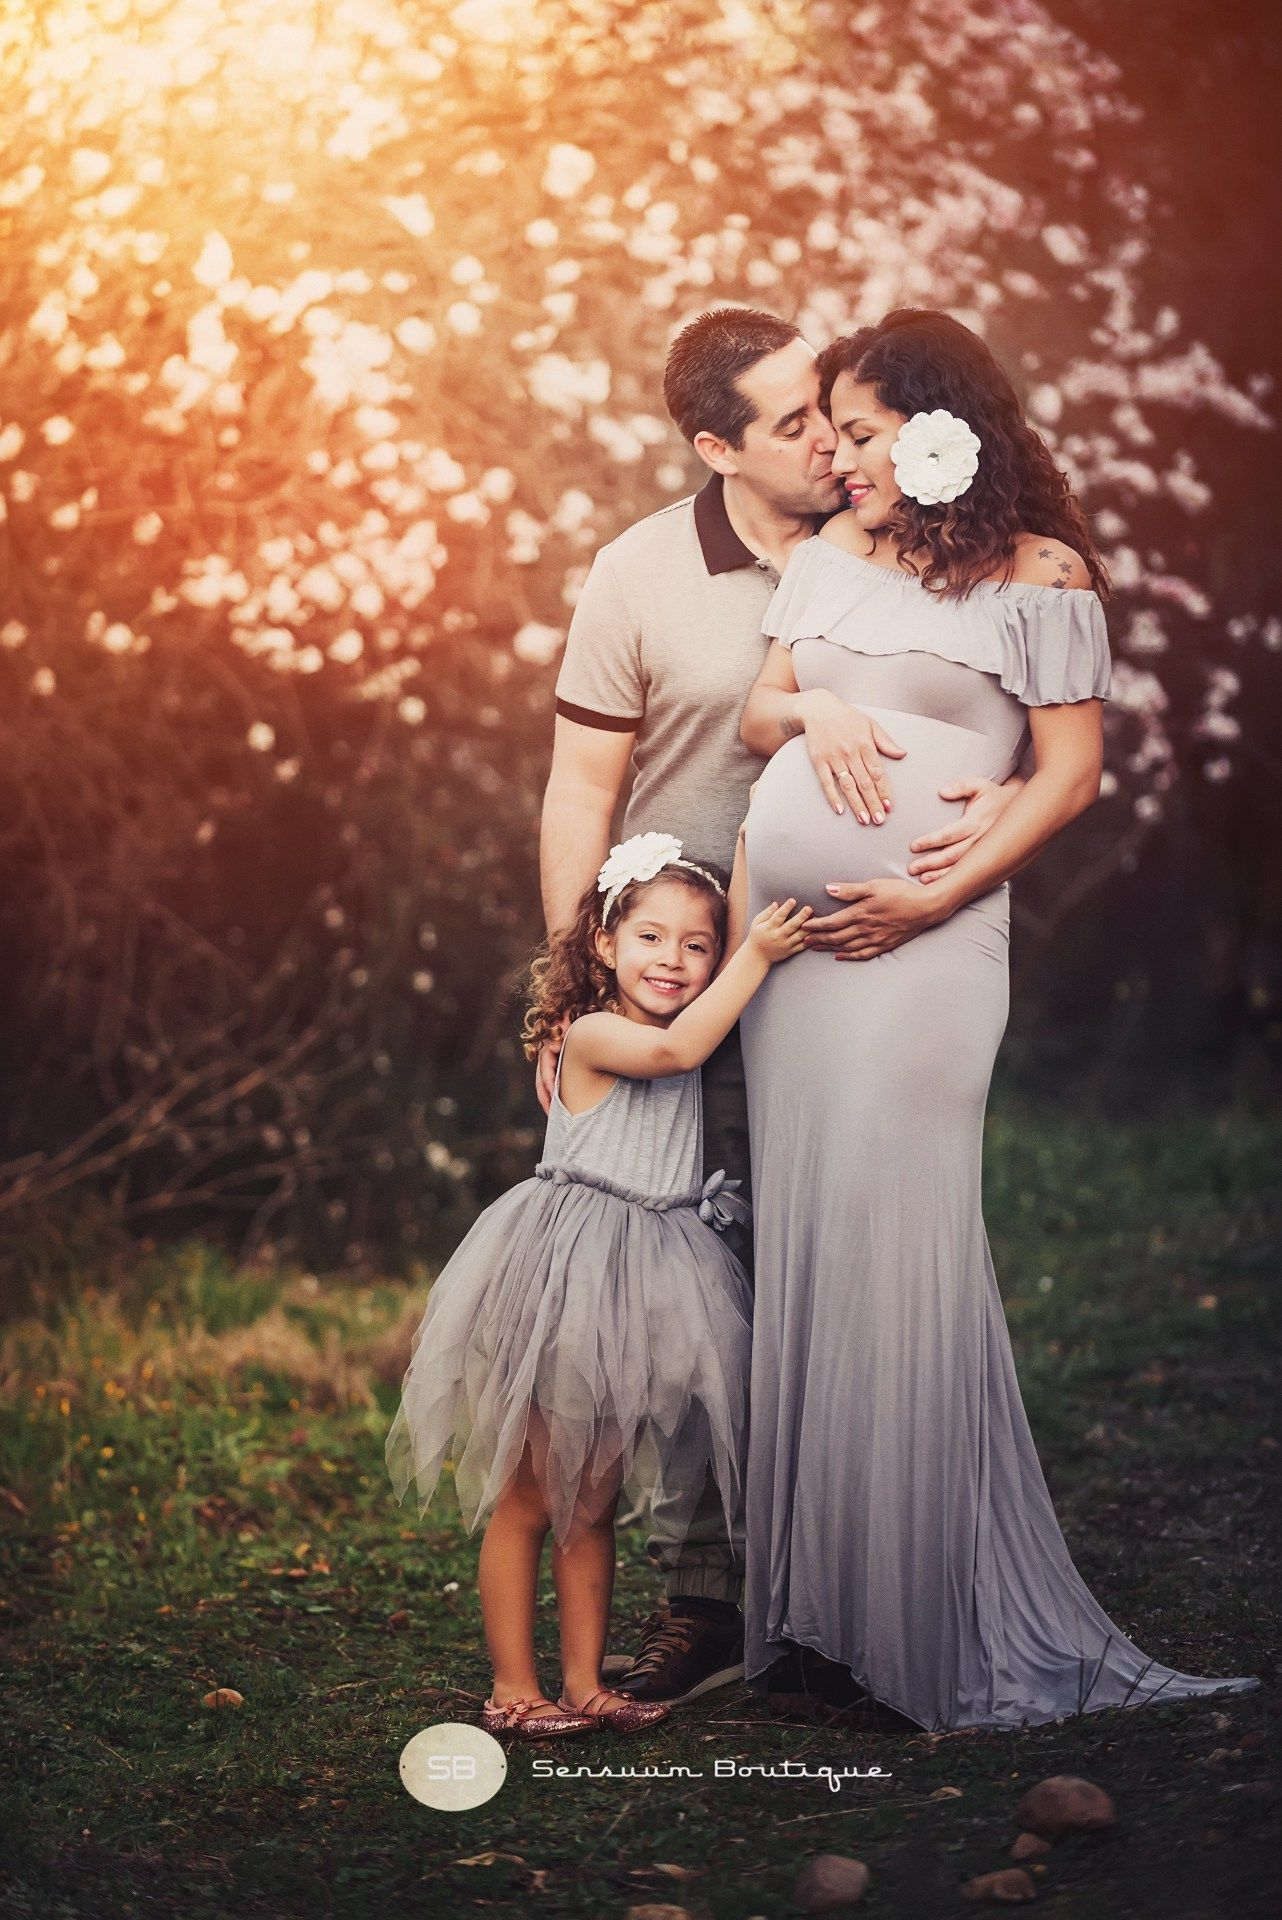 01a2a4c99  familia  bookfamiliar  fotosfamilia  embarazada  pregnacy  maternidad